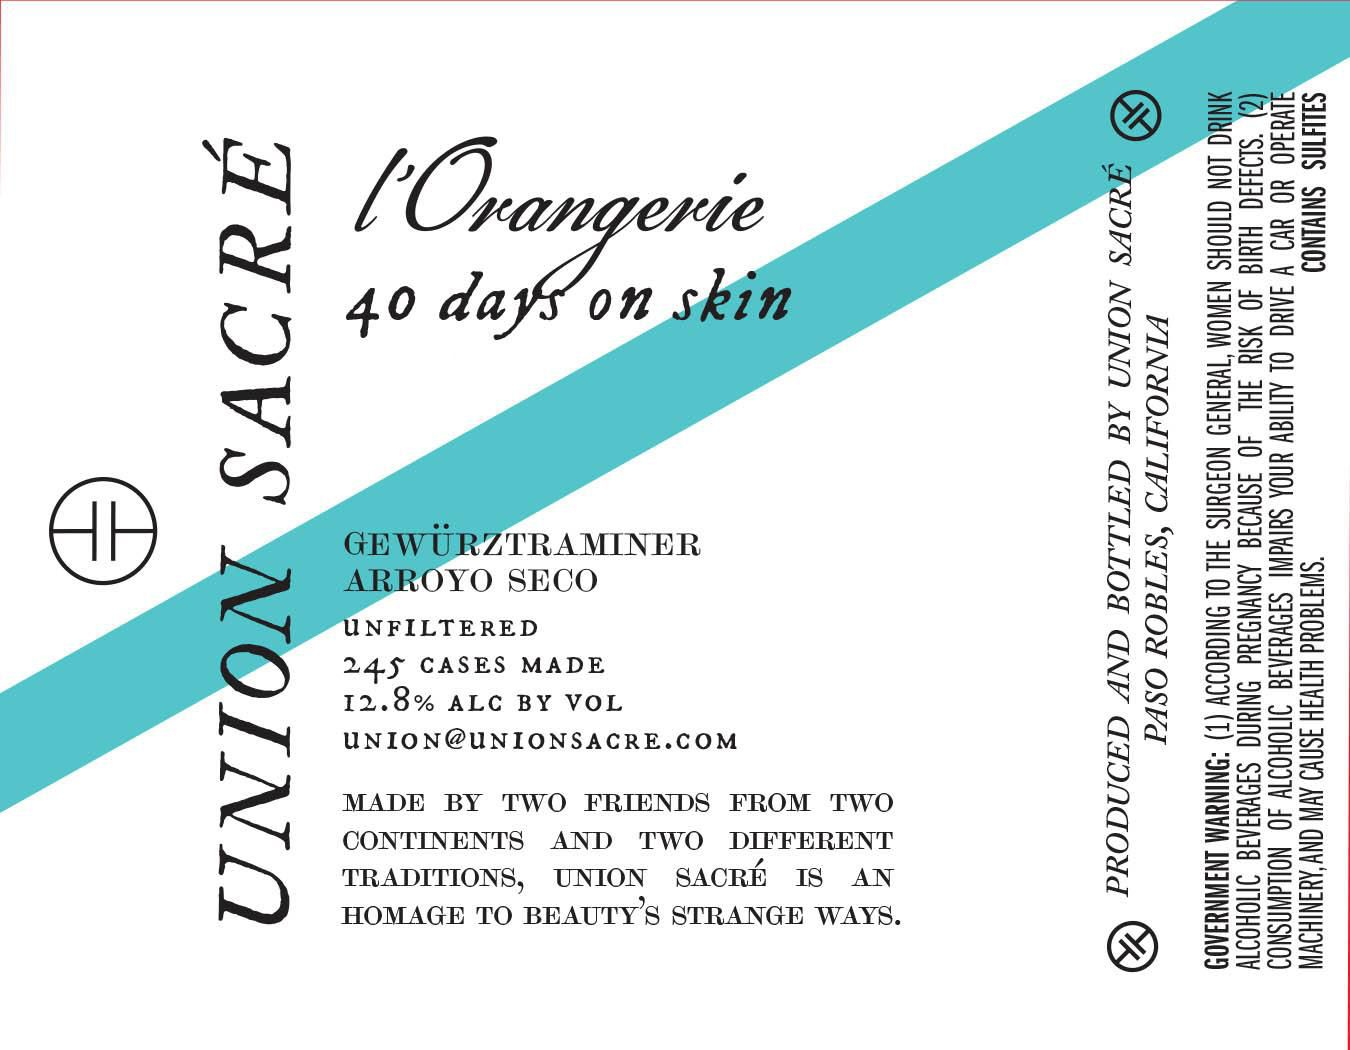 Union Sacre L'Orangerie Nuit Dry Gewurztraminer 2020